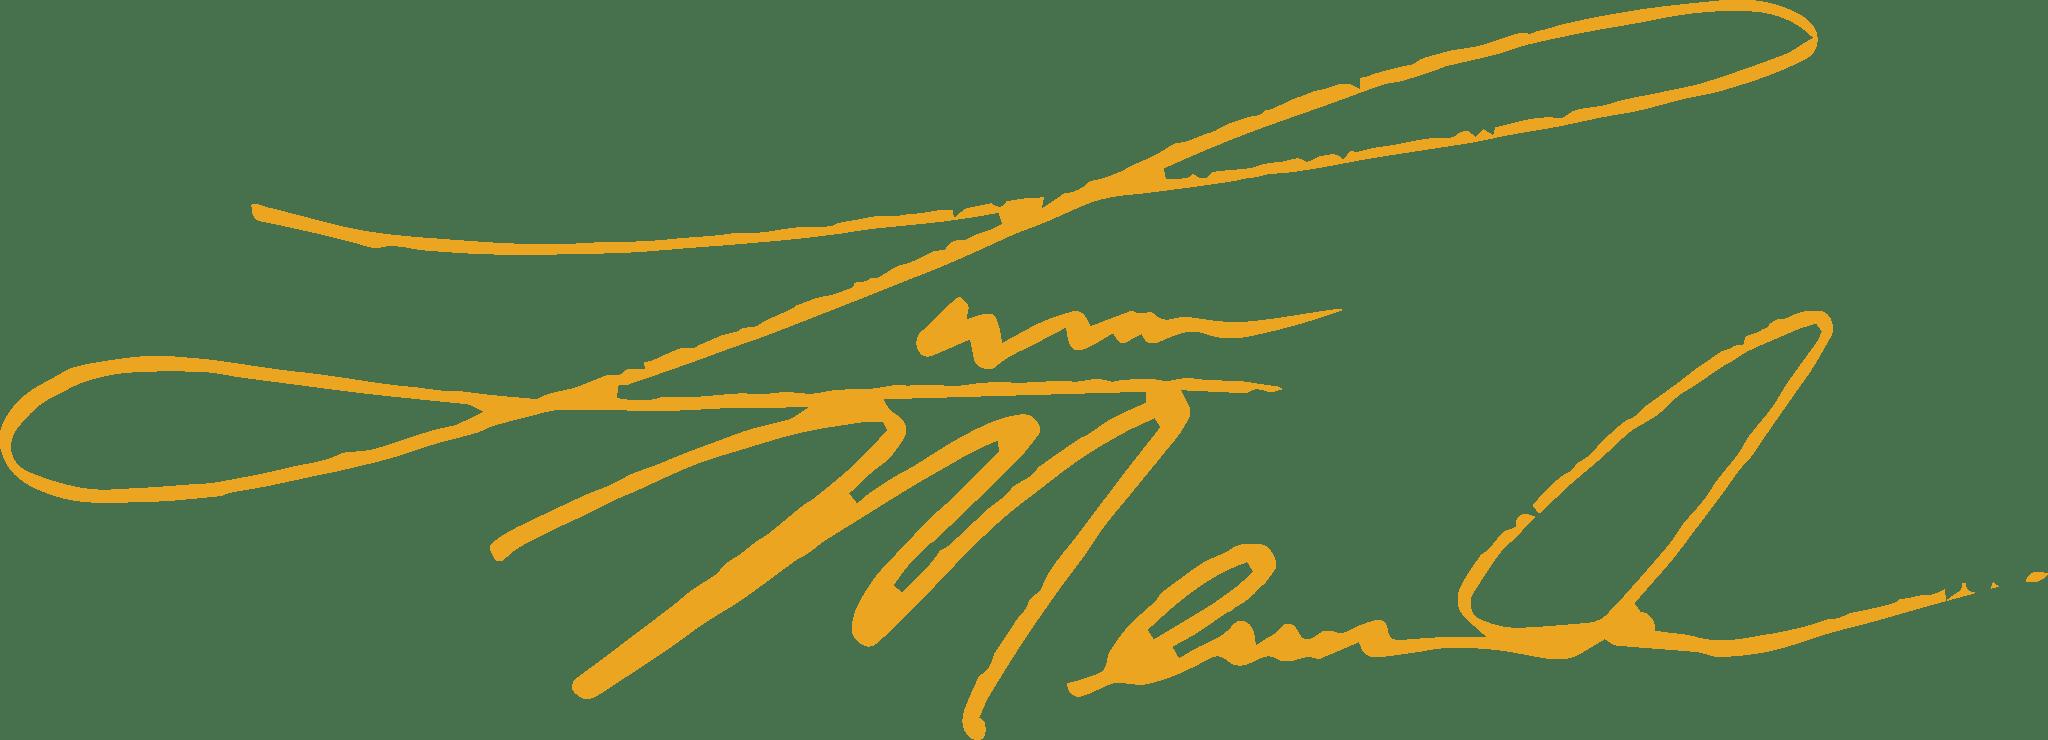 Lucas Meachem's Signature